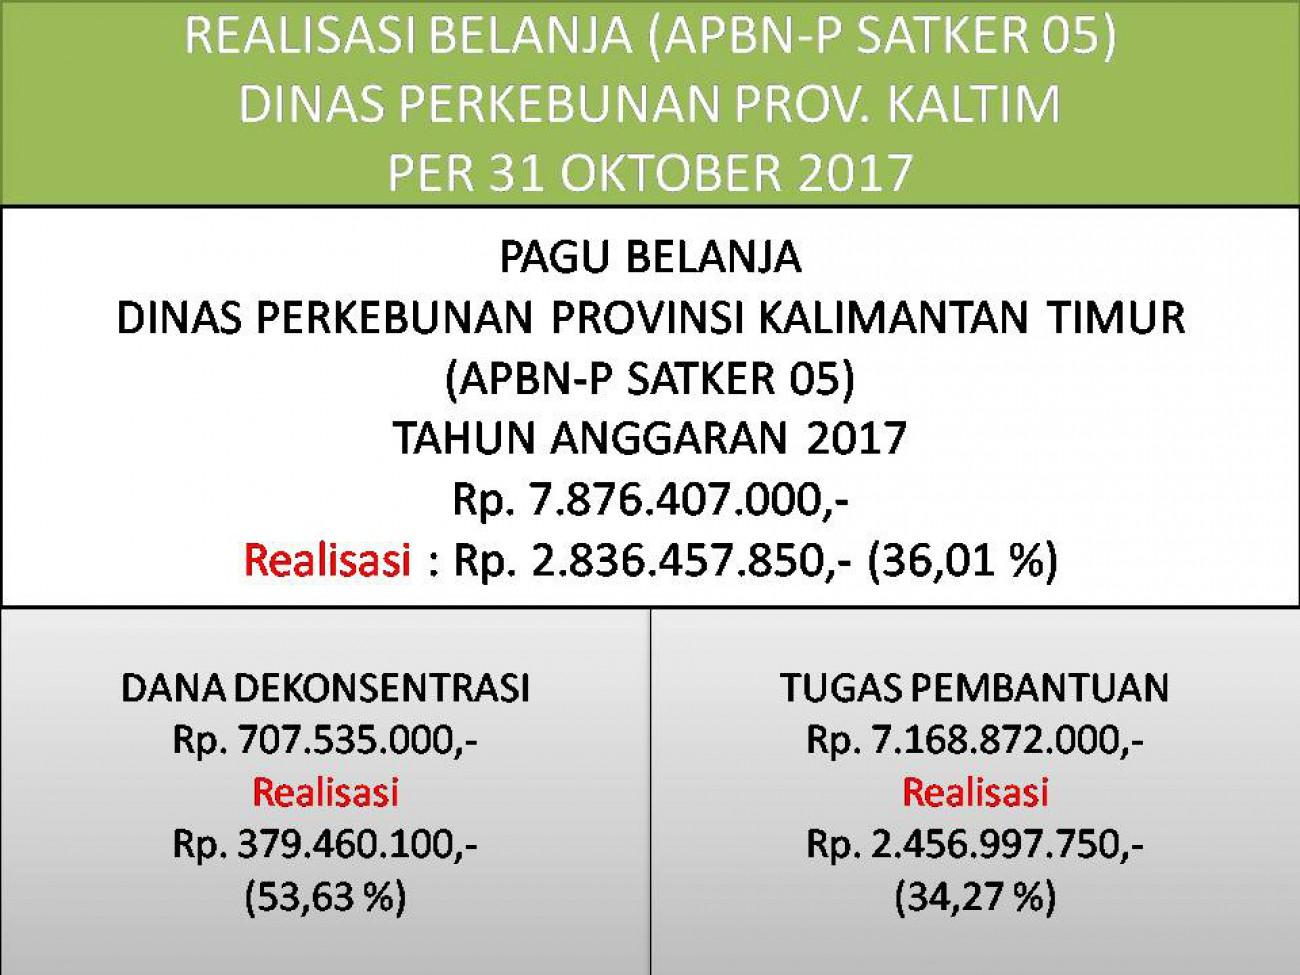 Laporan Realisasi APBN-P Satker 05 (Direktorat Jenderal Perkebunan) Dinas Perkebunan Prov. Kaltim Bulan Oktober 2017